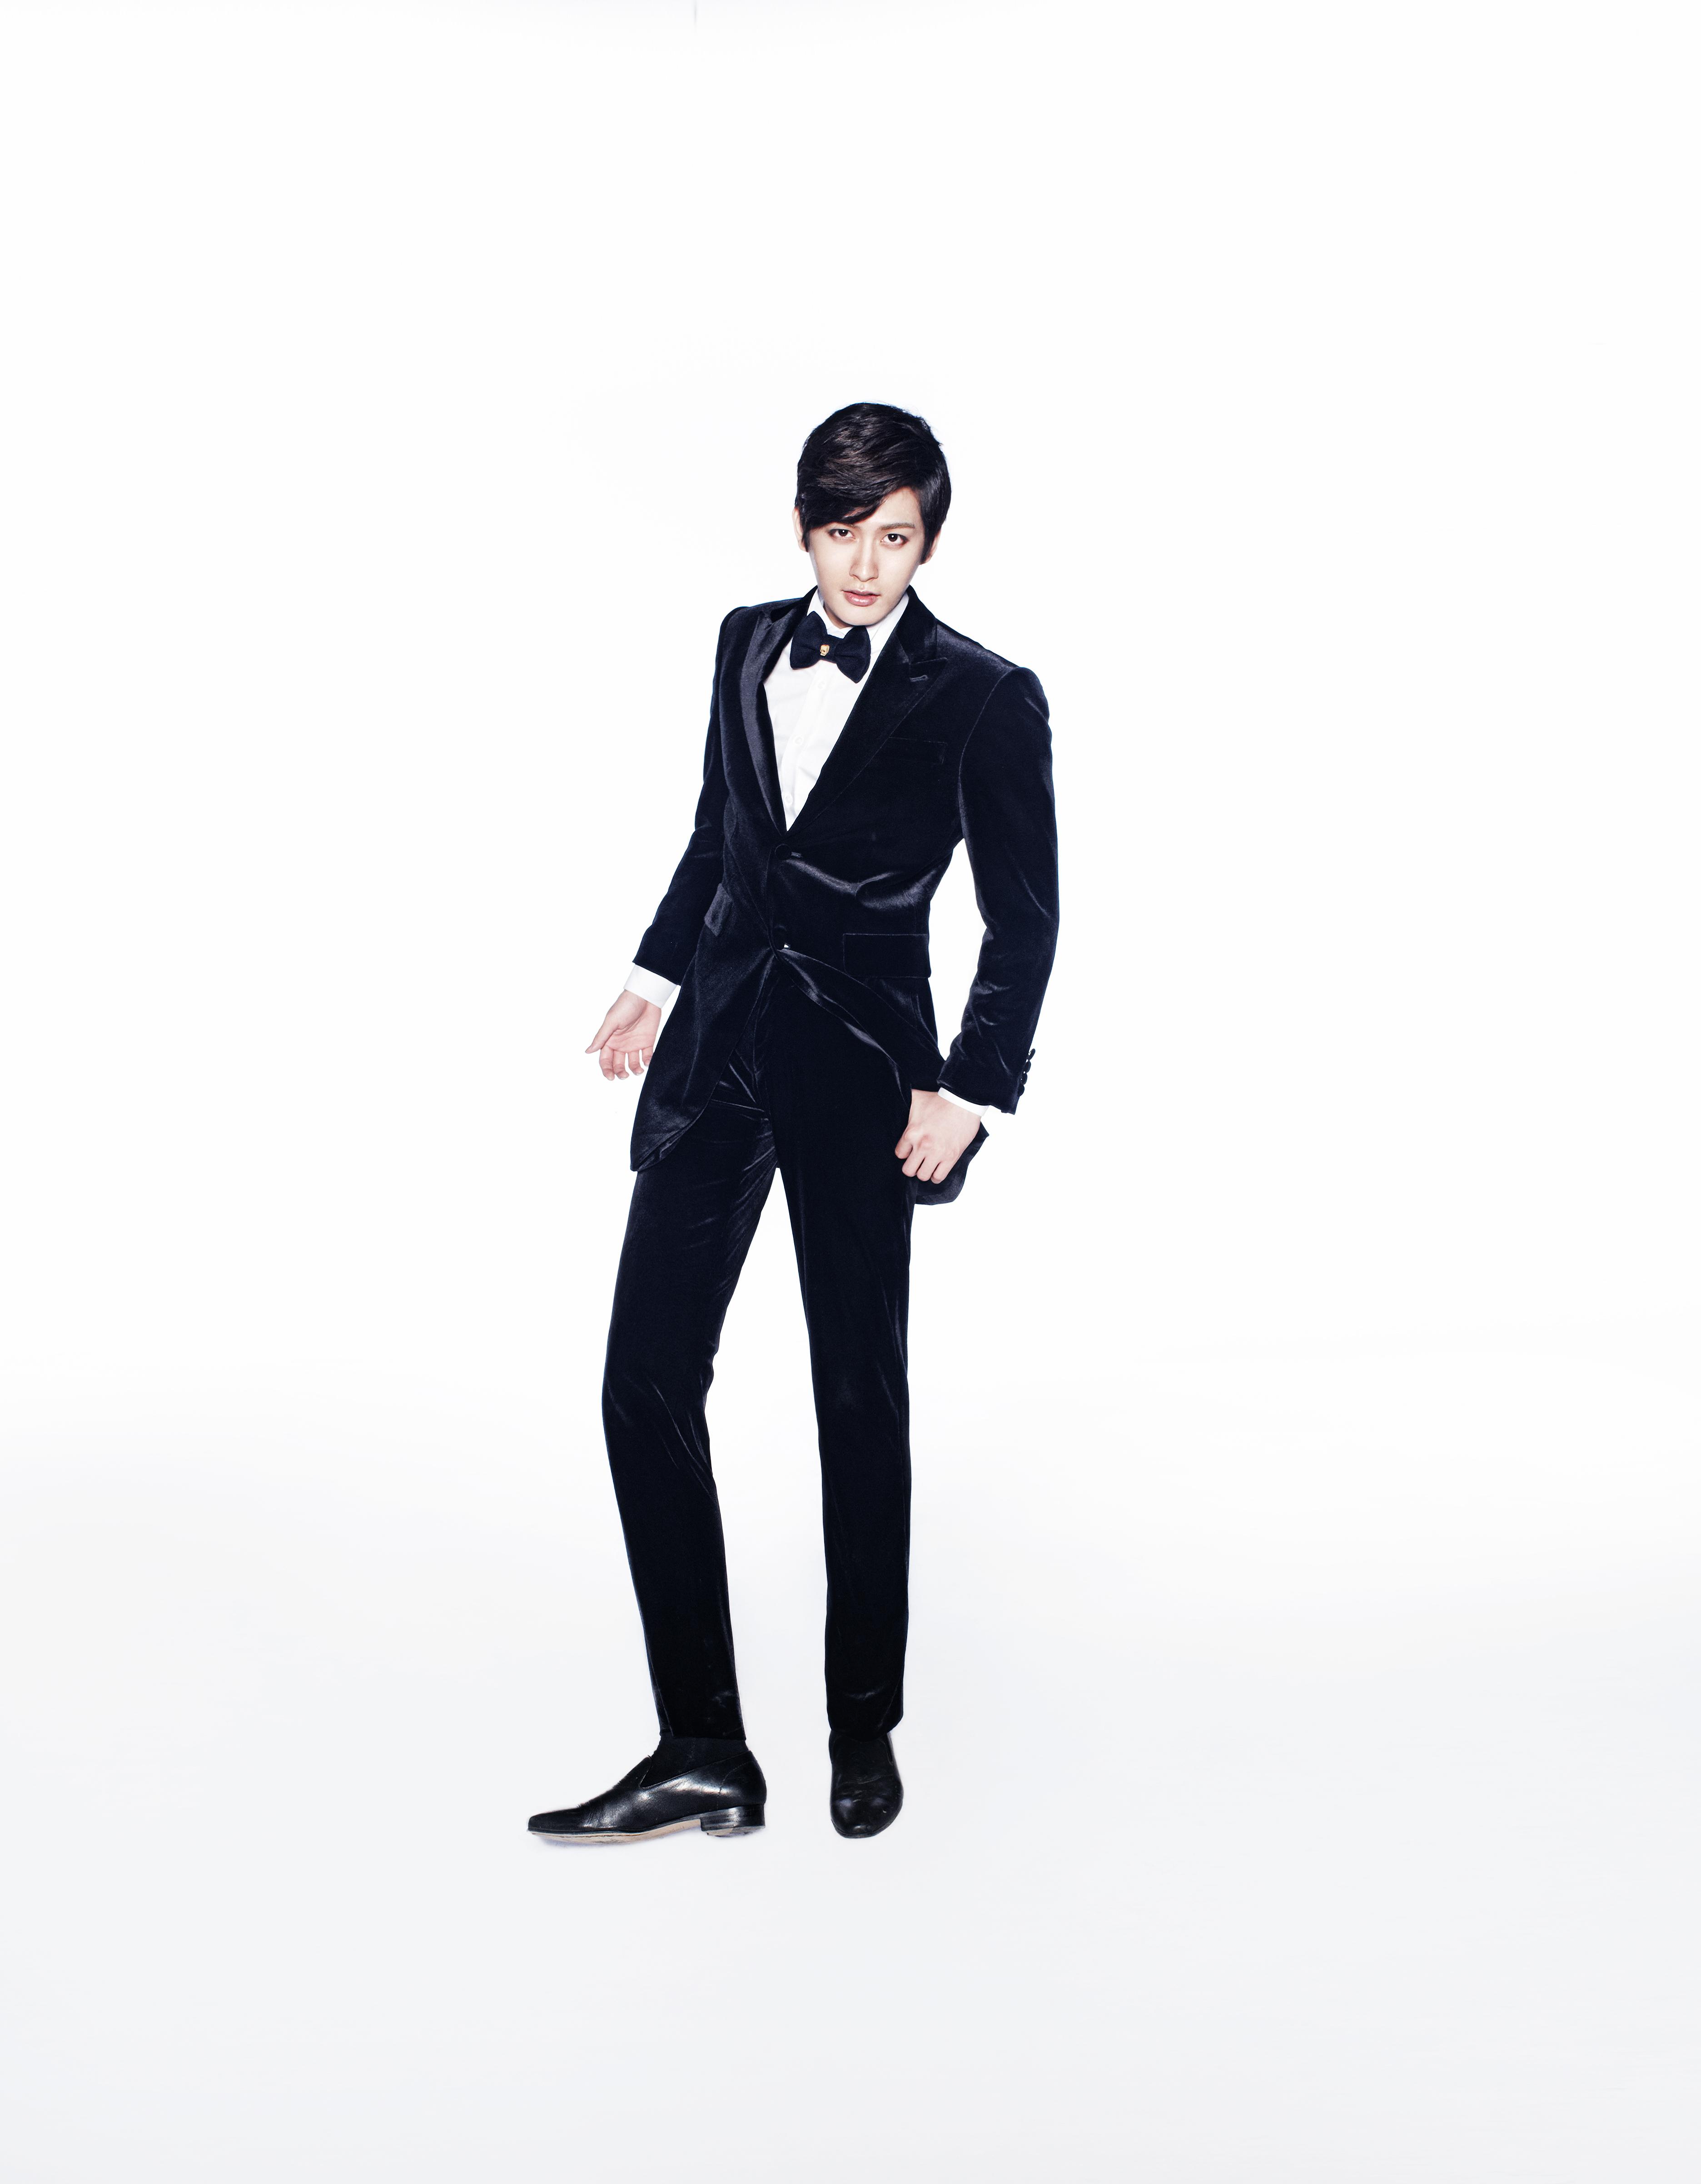 Download Wallpapers Download 2560x1440 Anonymous Suit Tie Guy